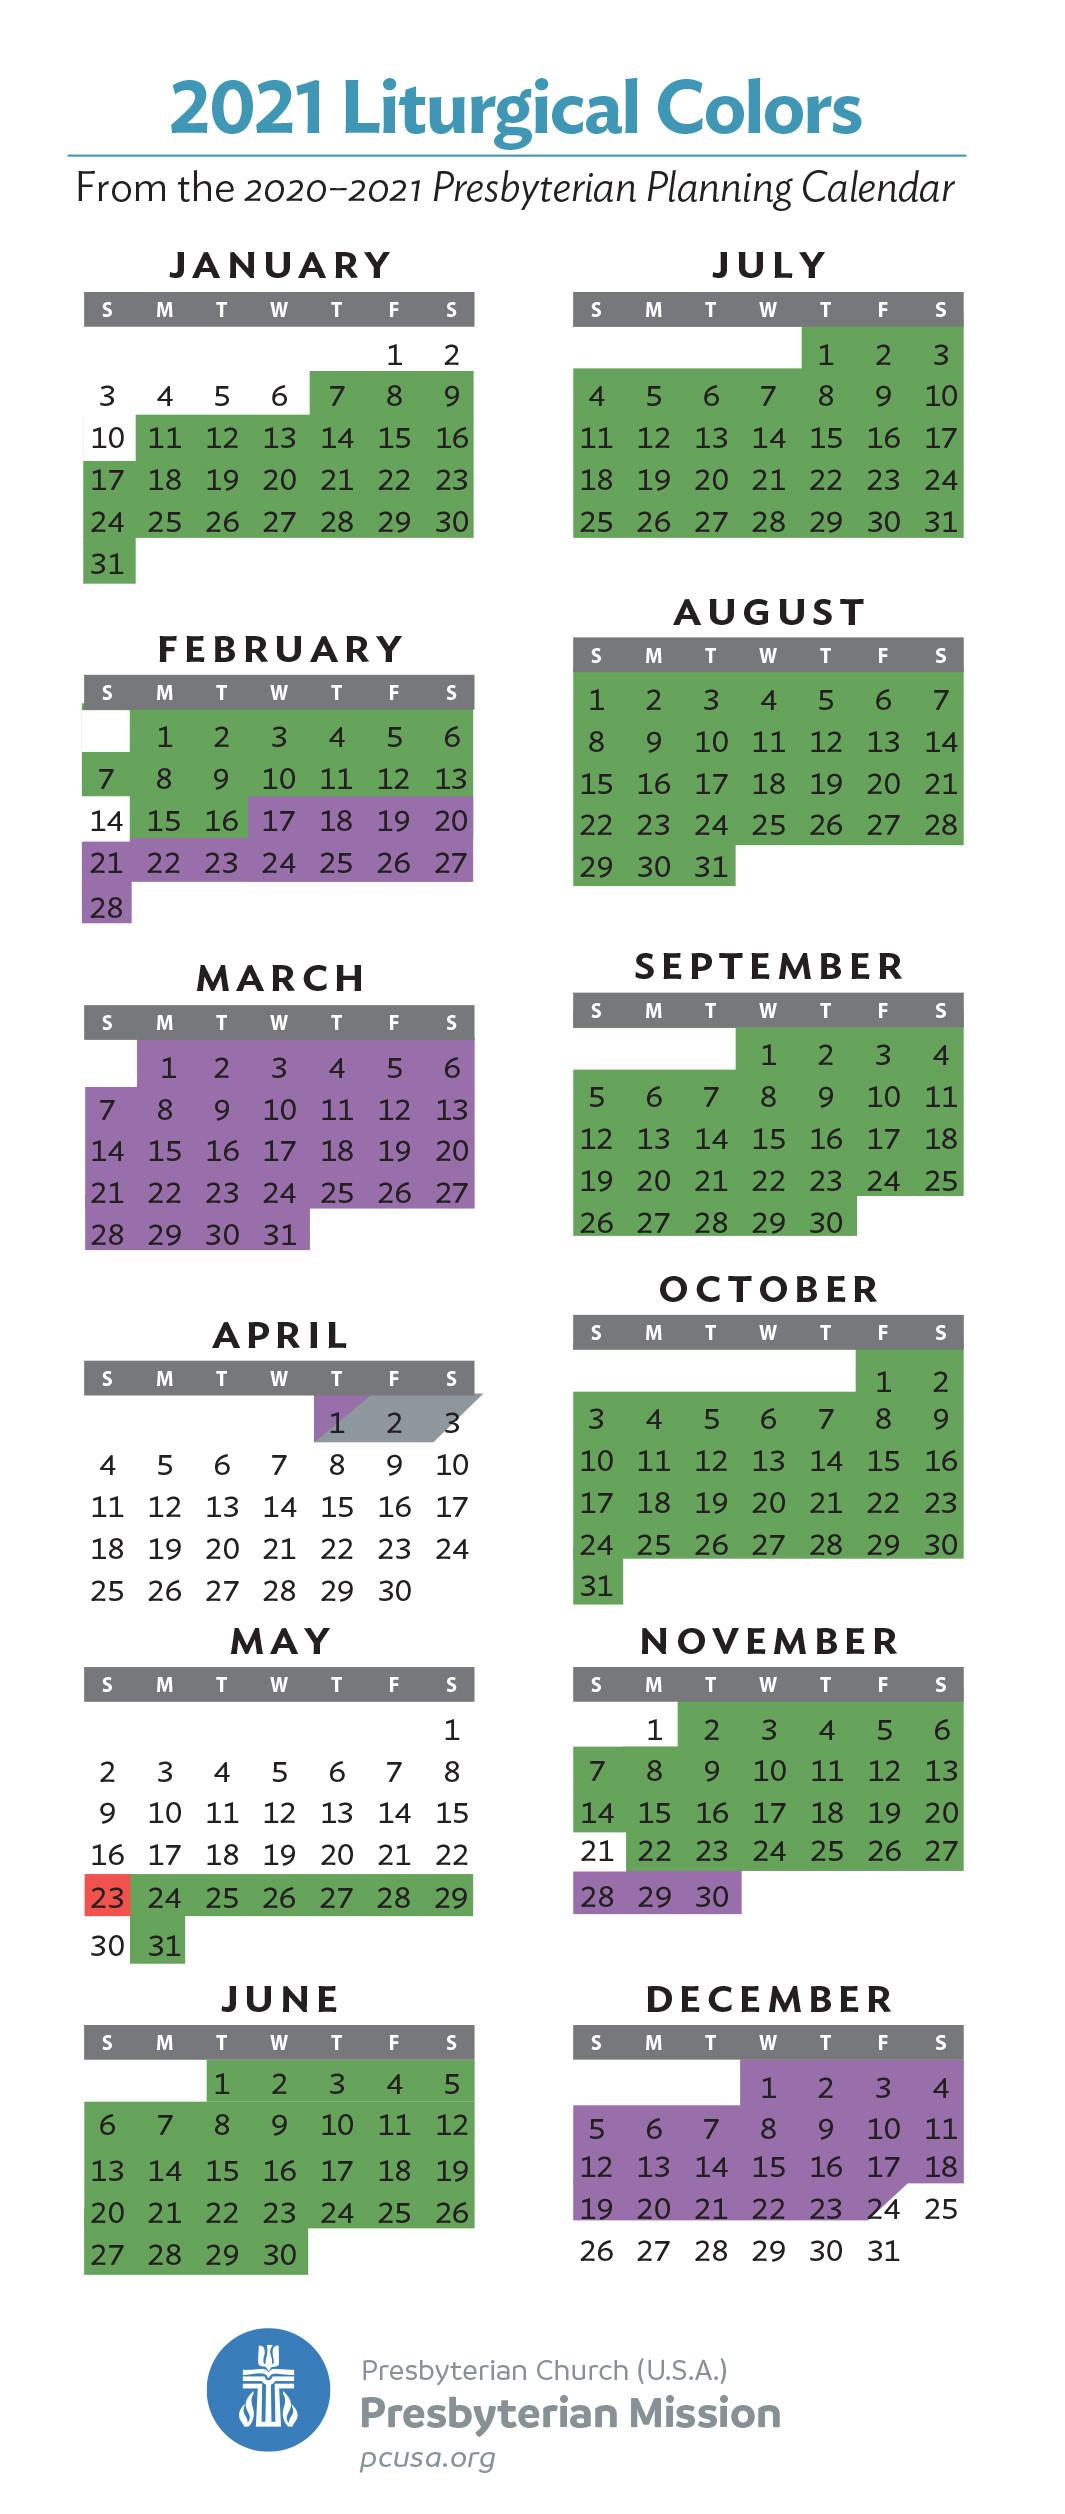 2021 Liturgical Colors - Presbytery Of St. Augustine  Printabel Lectionary Clalendar For 2021 Umc